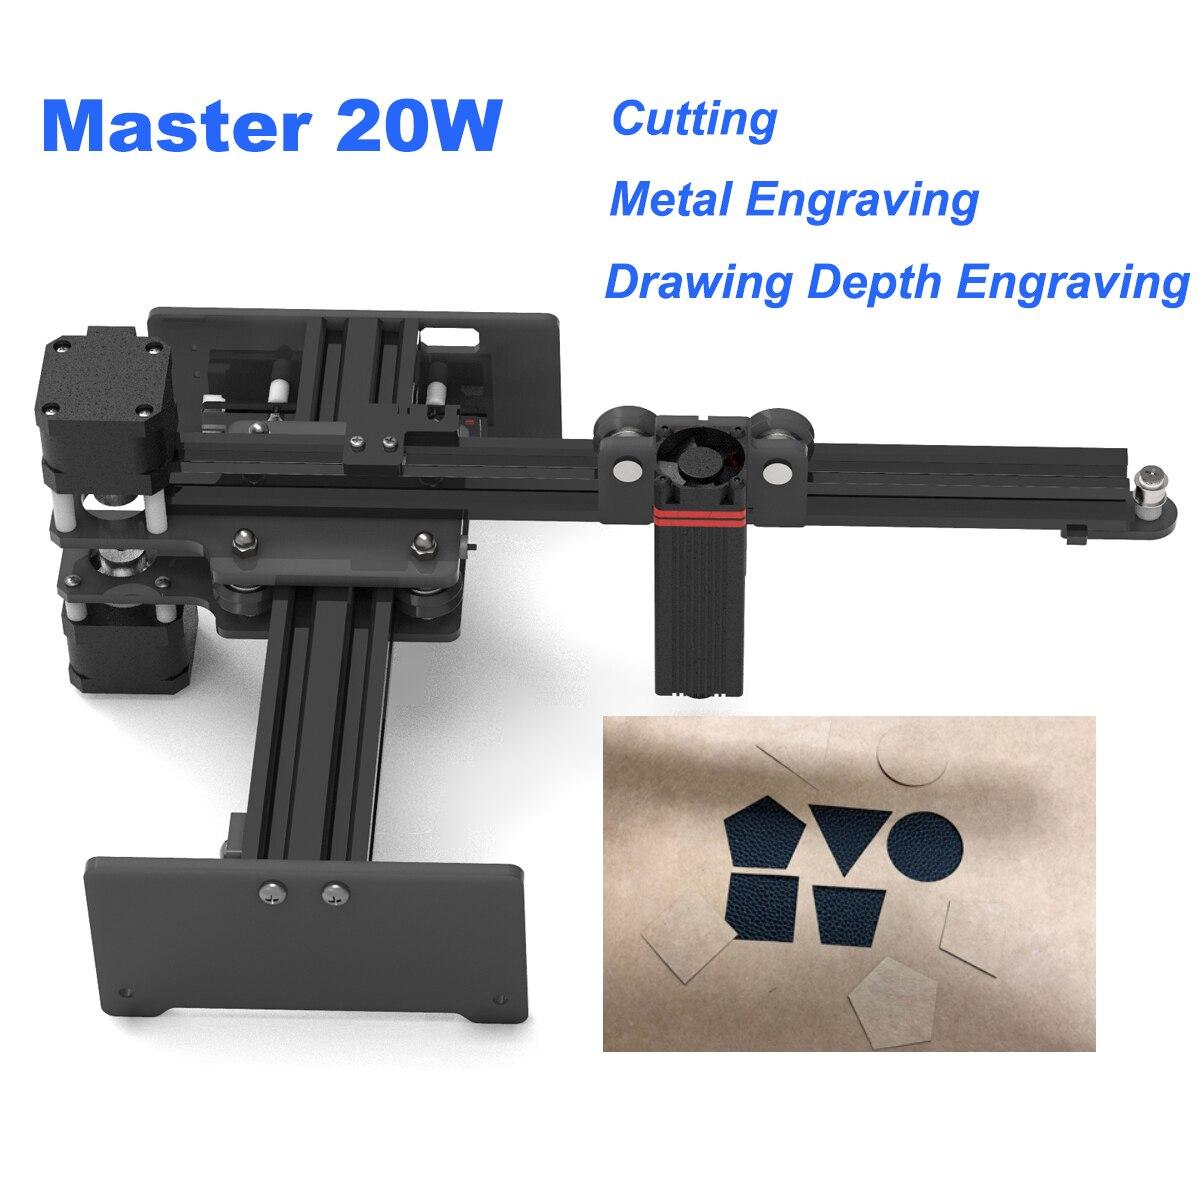 NEJE MASTER 20W Laser Engraving Machine DIY Mini CNC Cutting Wood Router Desktop Engraver For Metal/Wood/Plastics